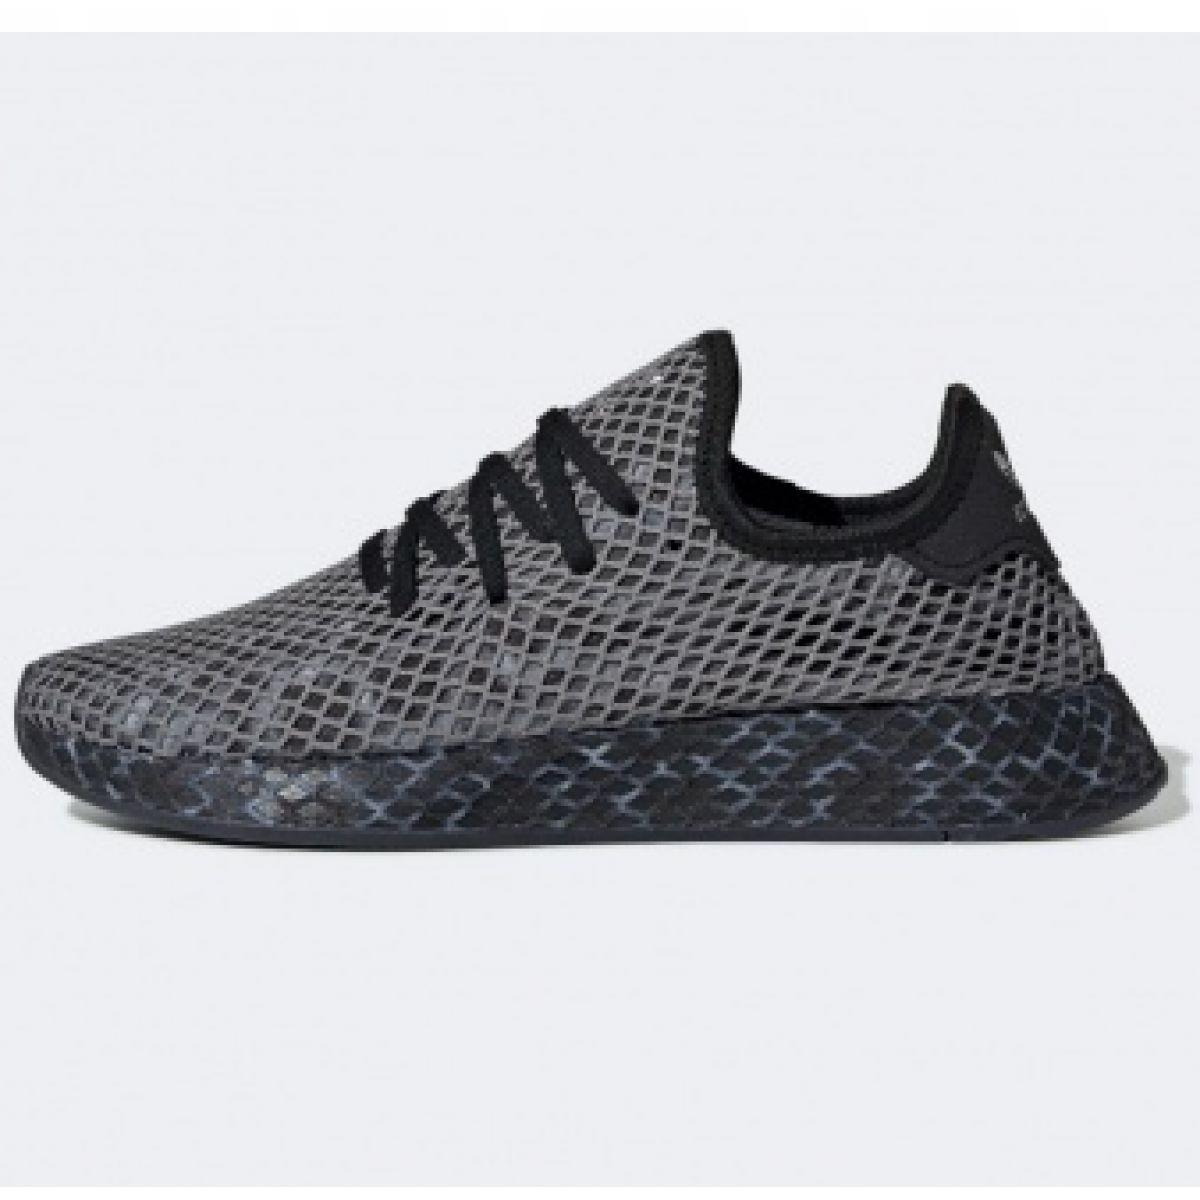 Details zu Adidas Originals Deerupt Runner M EE5657 Schuhe